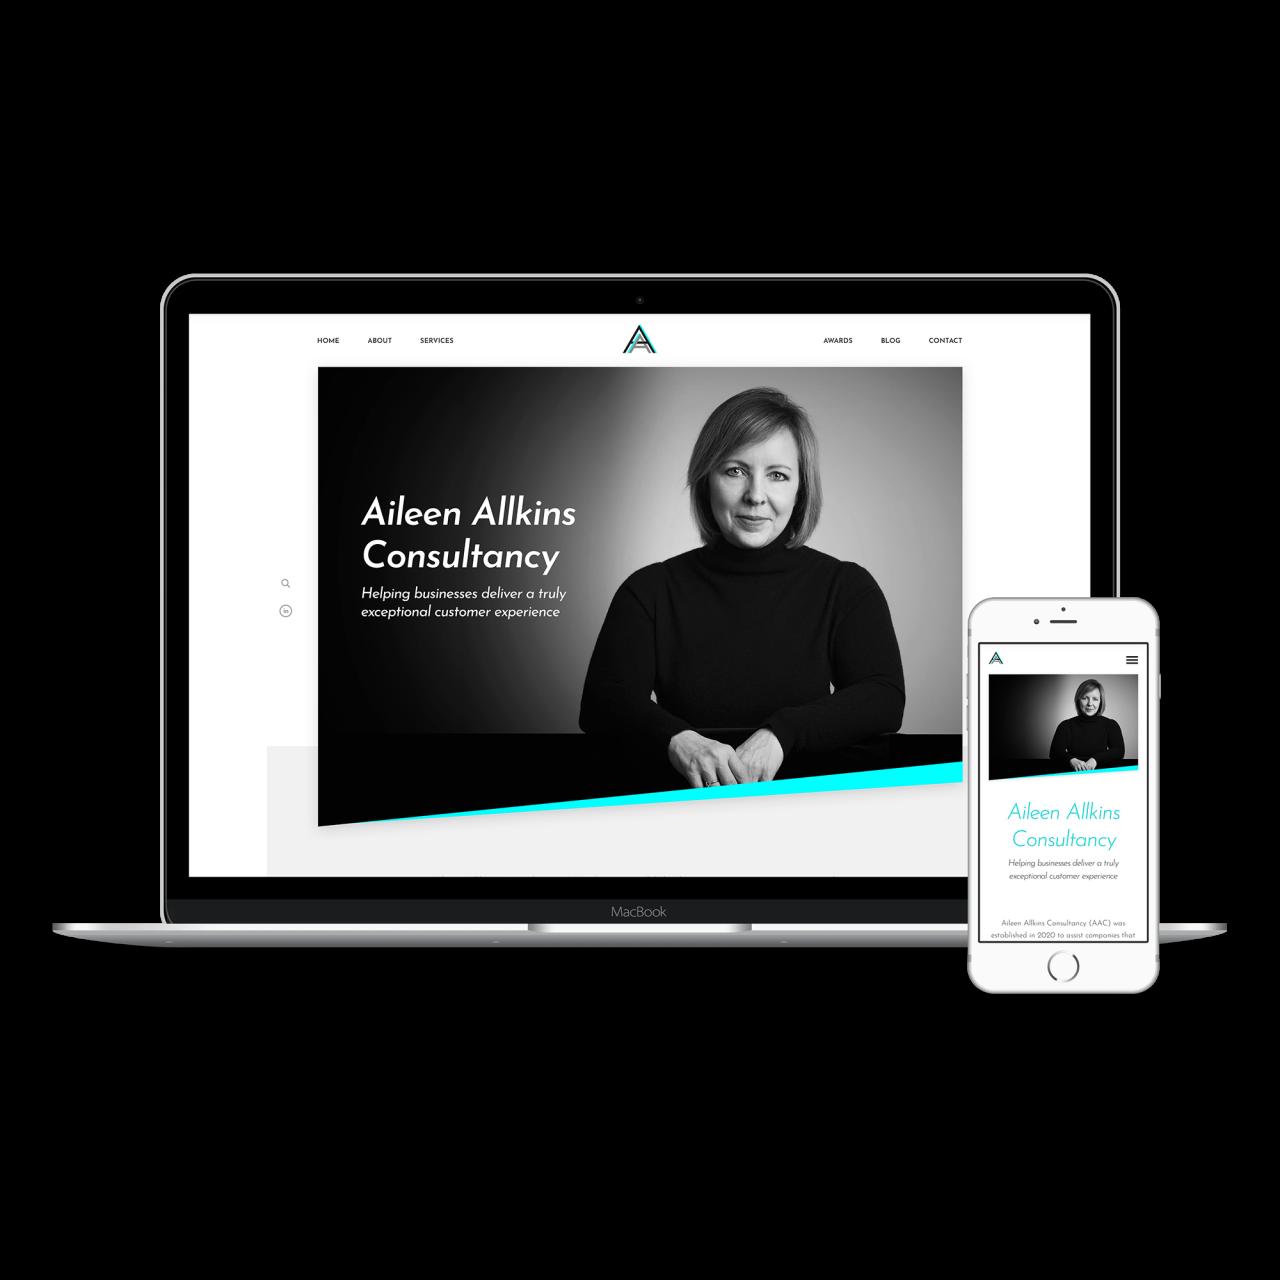 Aileen Allkins Website | Tom Hoadley | Freelance Wordpress Developer